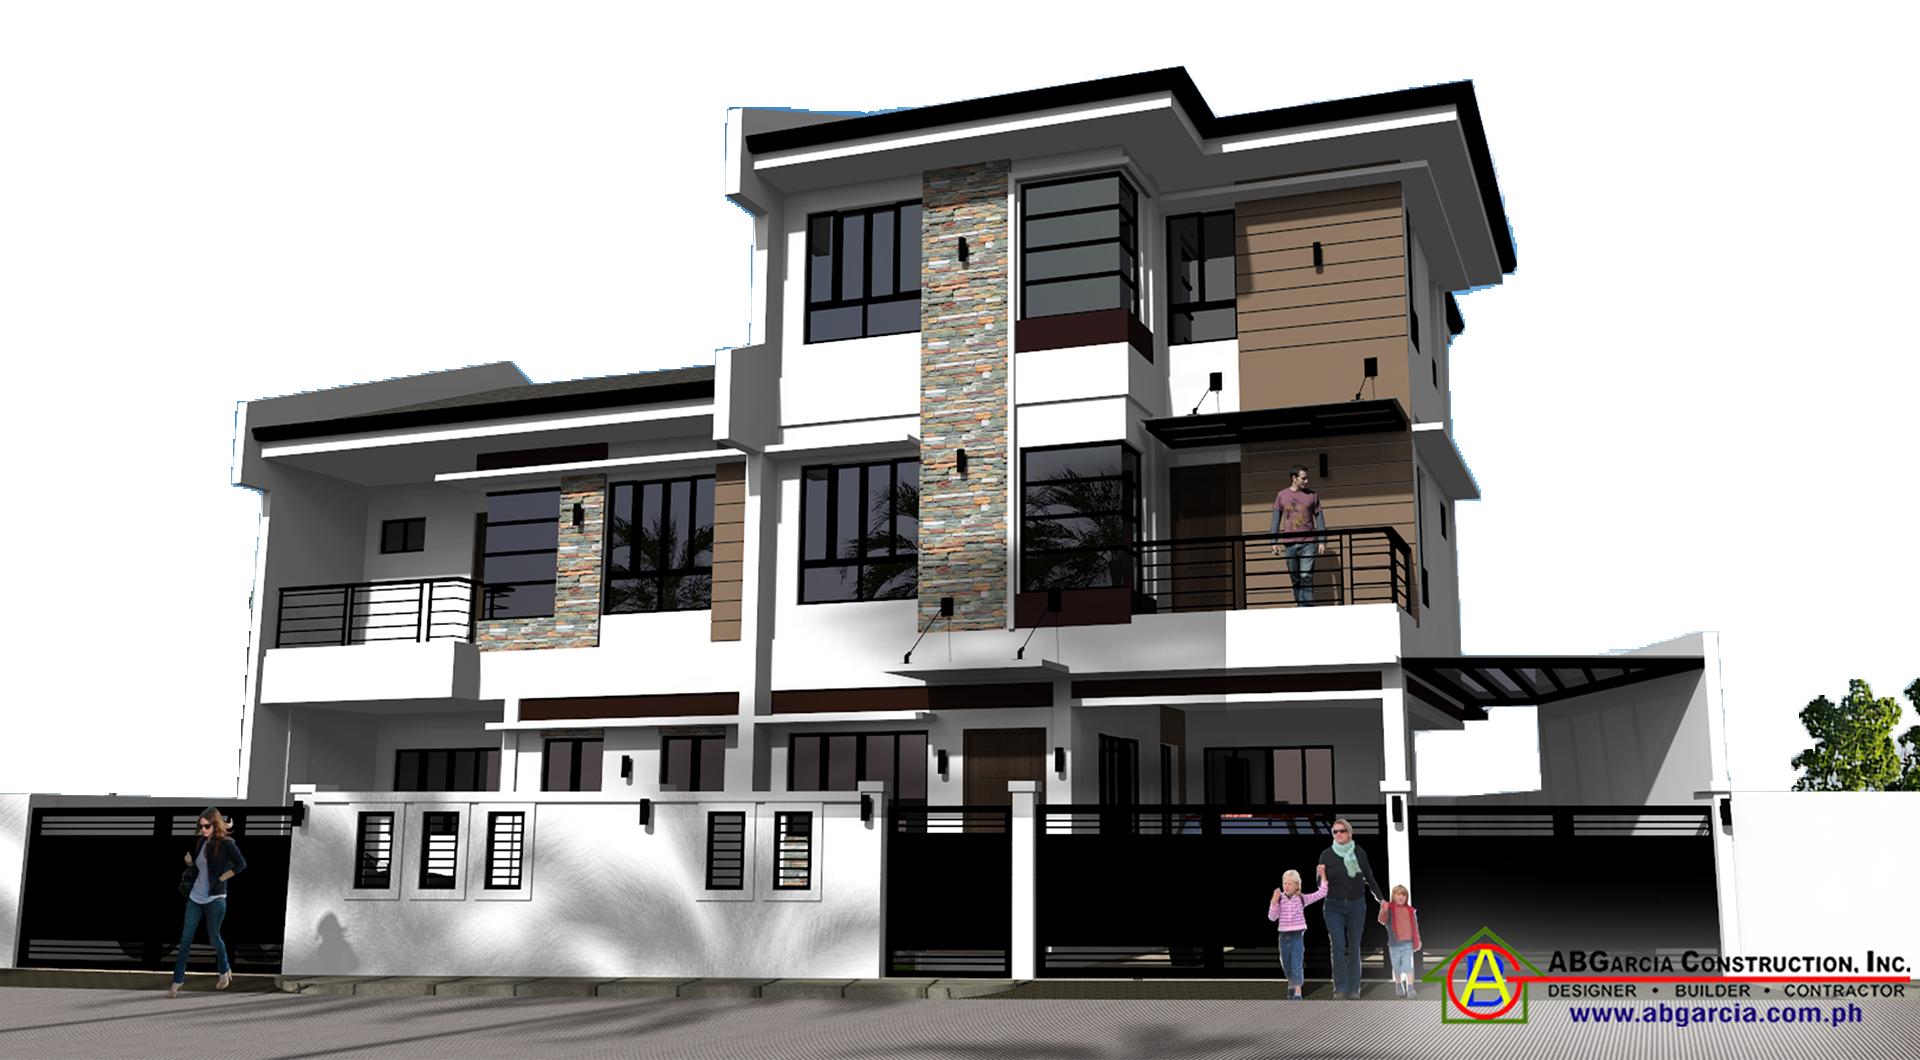 AB Garcia Construction, Inc. - Designer. Builder. Contractor ...